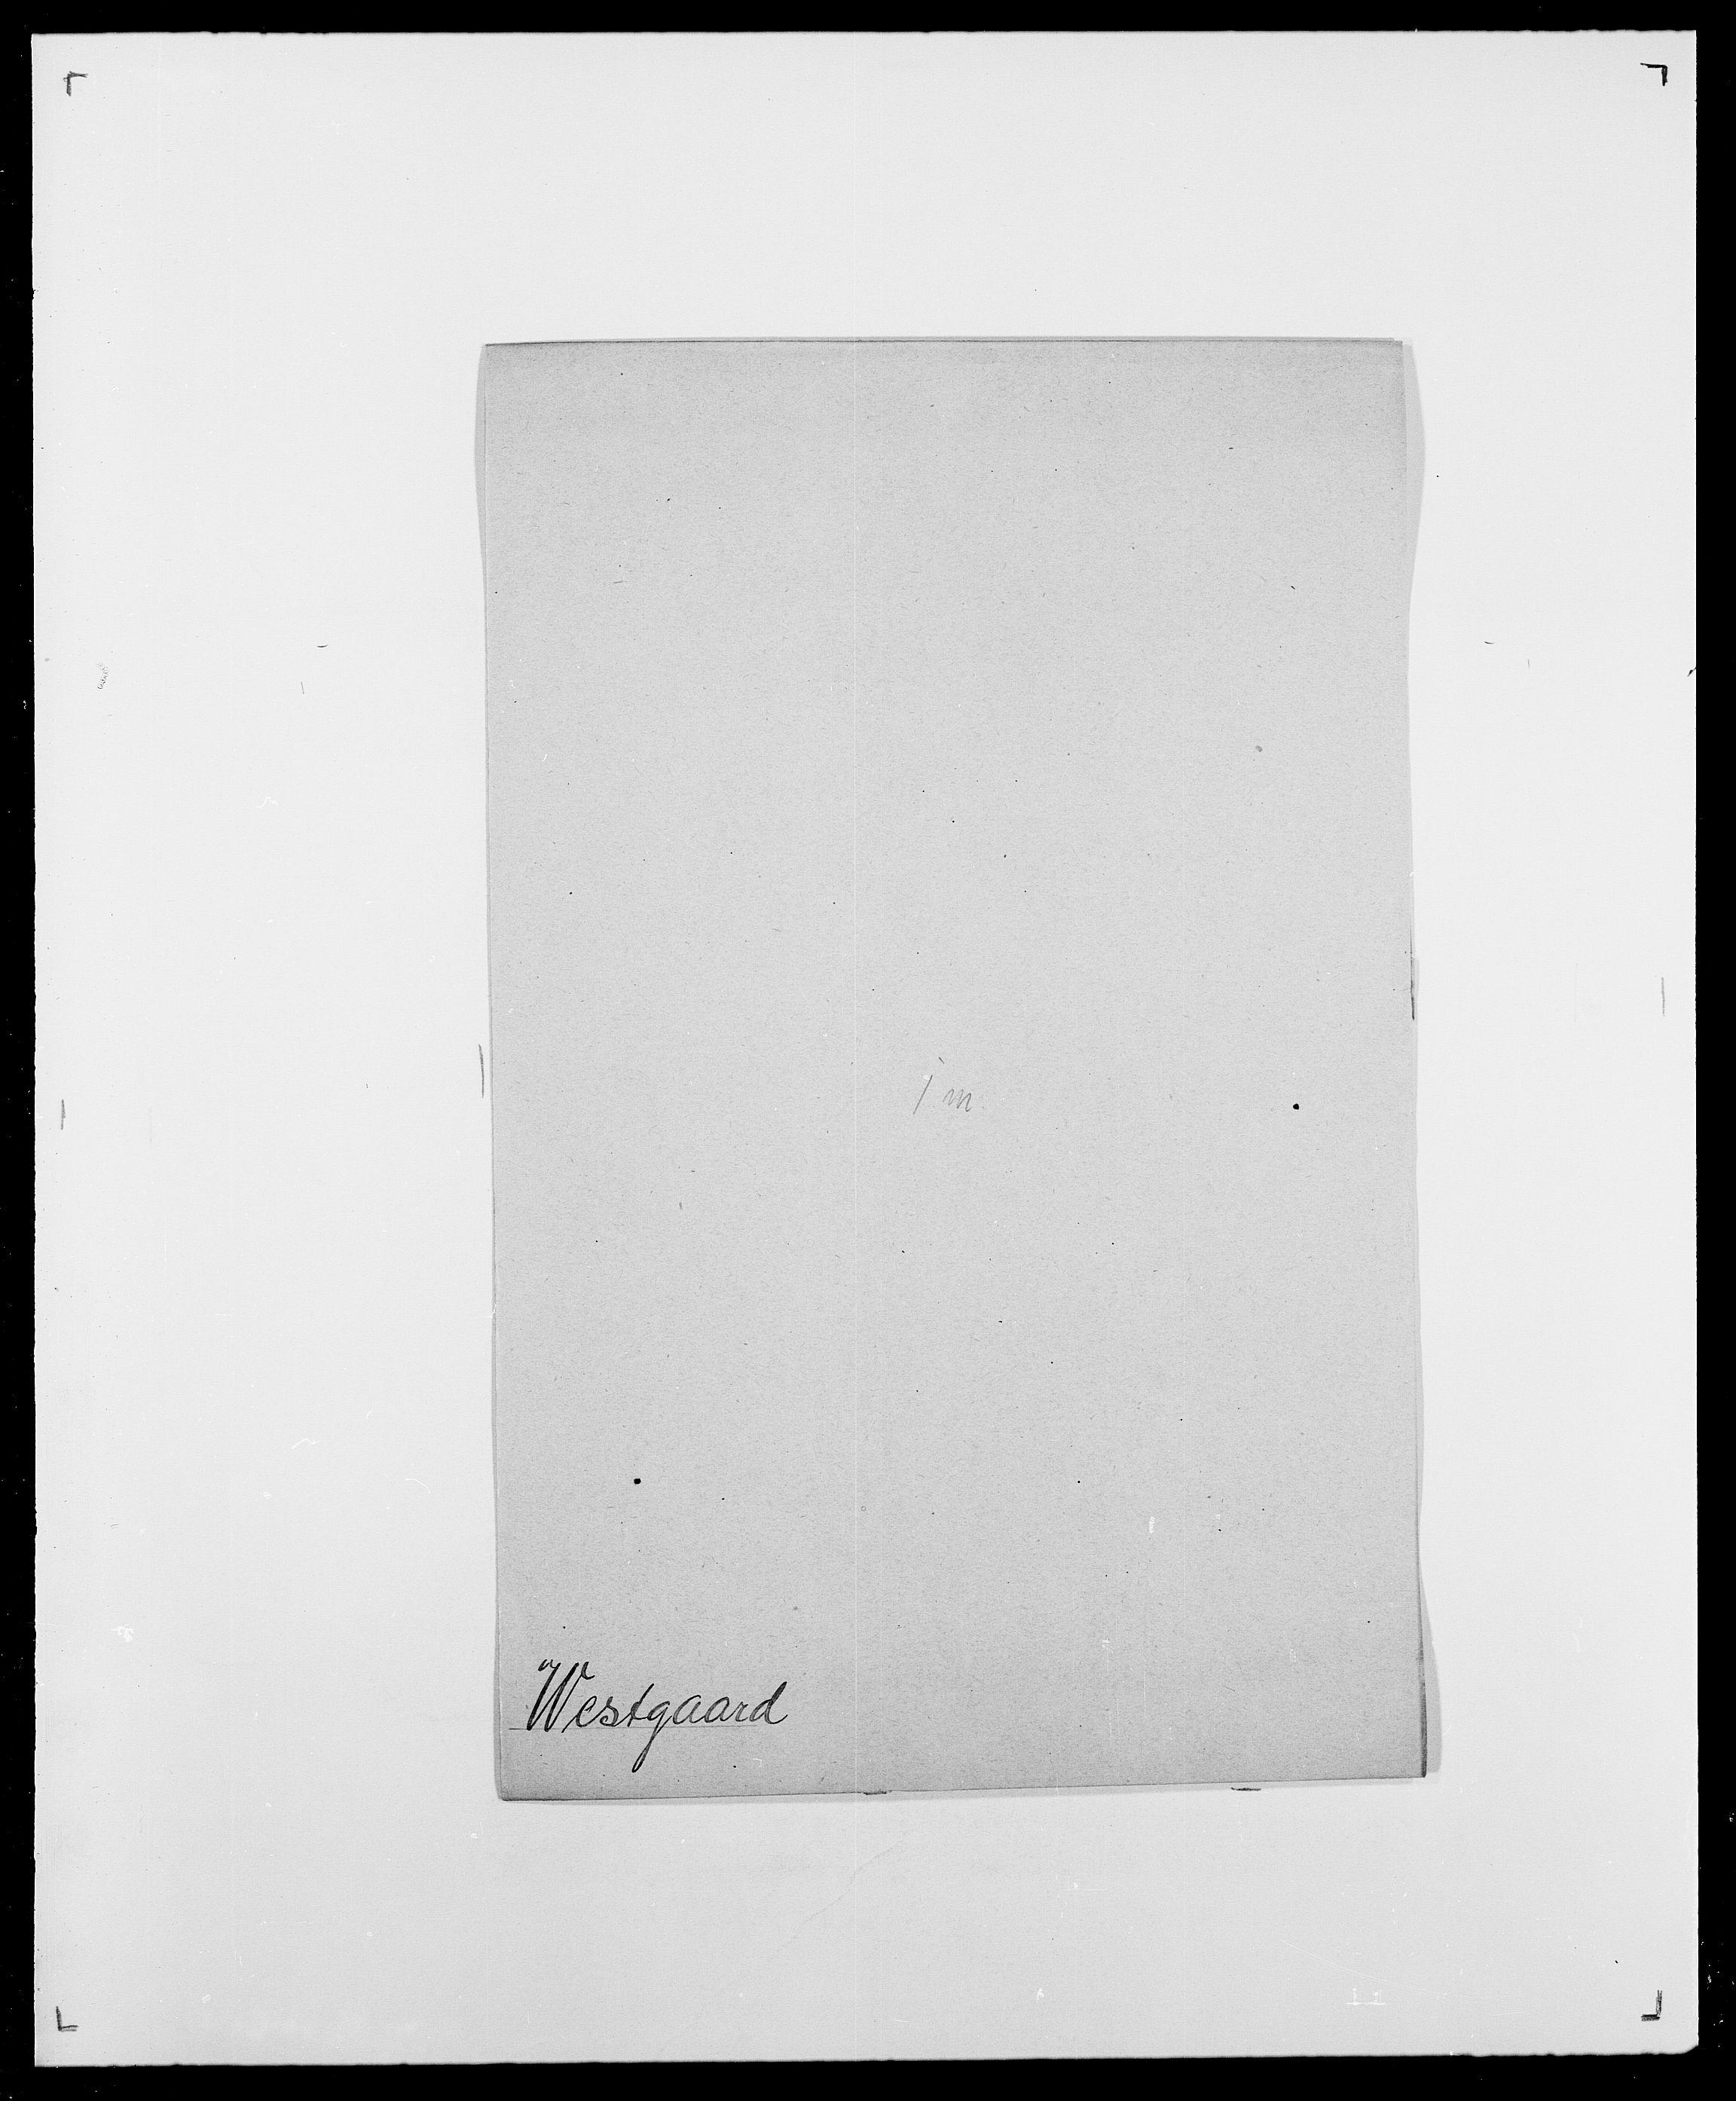 SAO, Delgobe, Charles Antoine - samling, D/Da/L0041: Vemmestad - Viker, s. 294